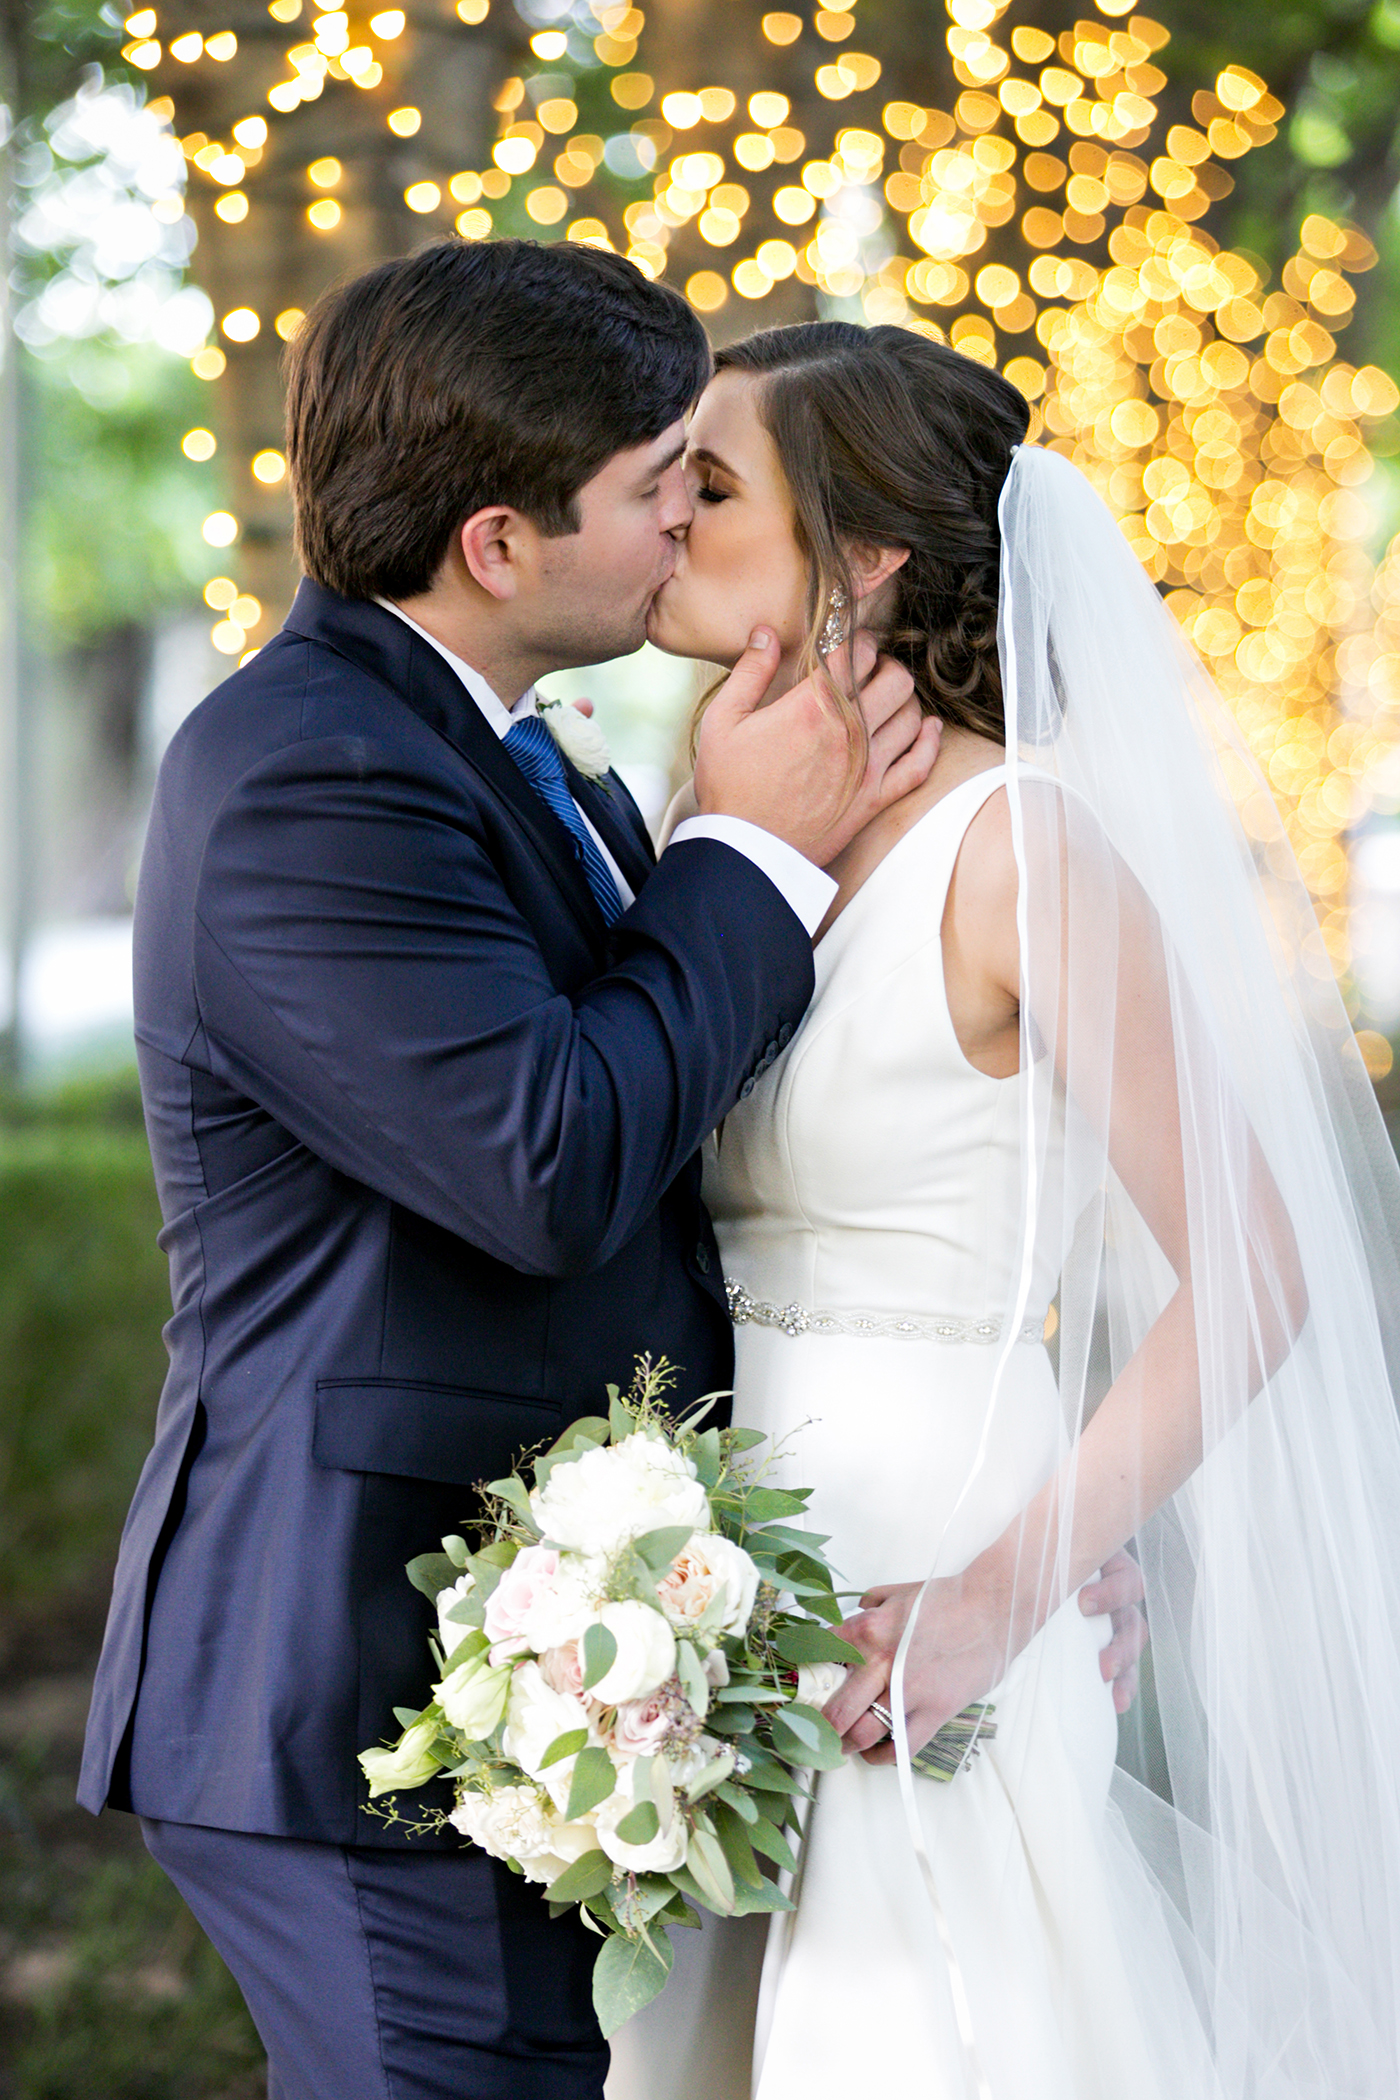 Wedding Planner Dallas TX - Allday Events - Highland Park - Marie Gabrielle Wedding - 275.jpg